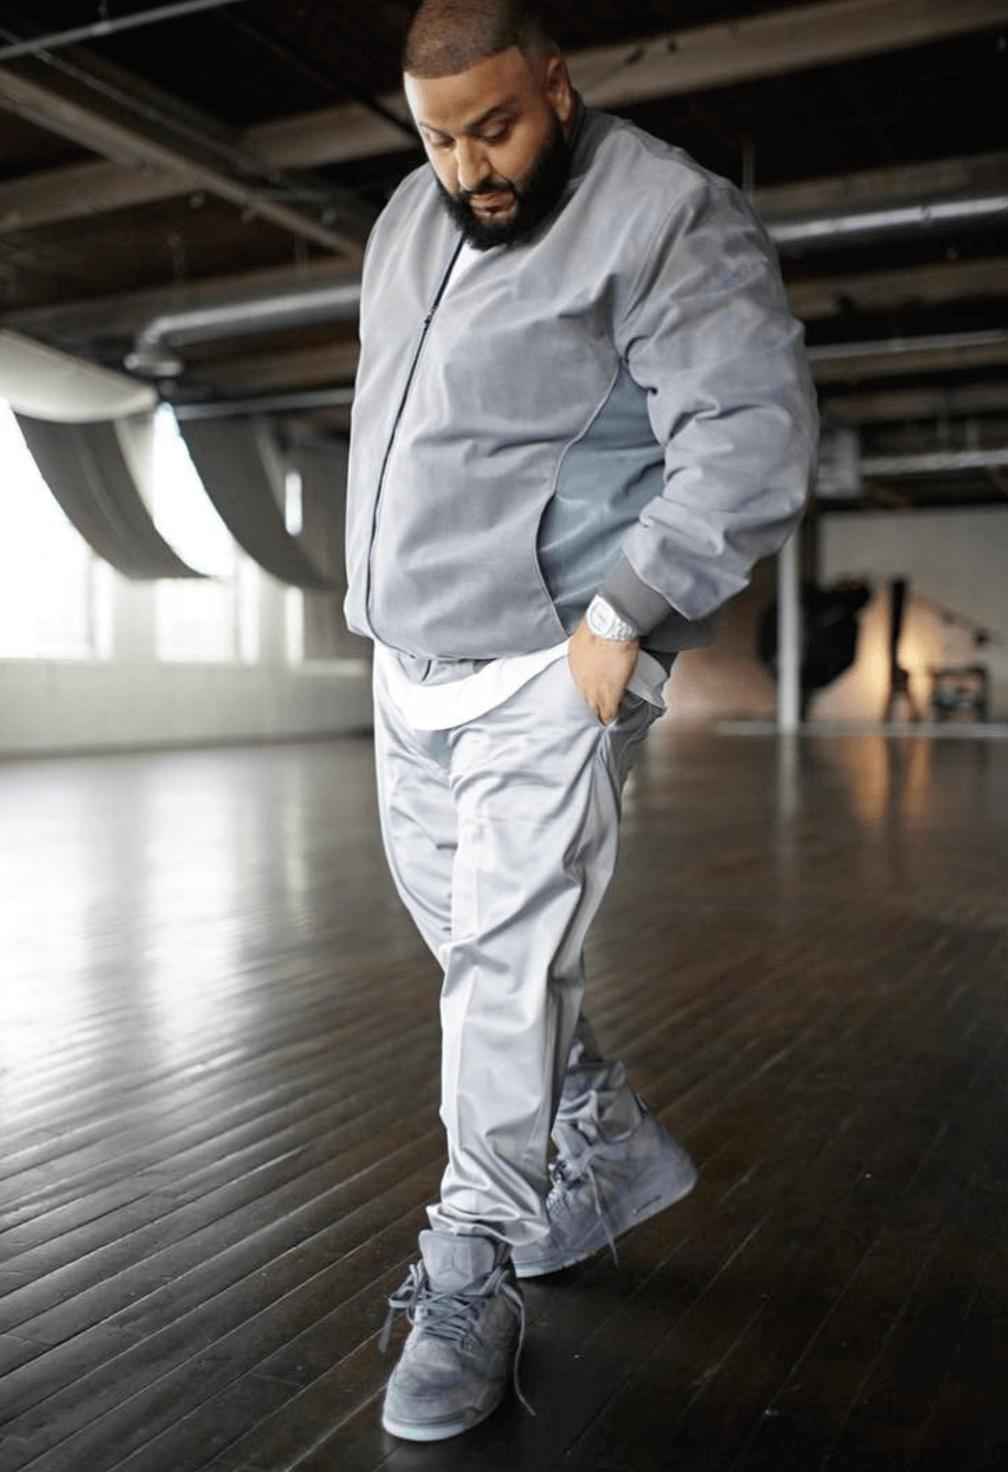 fa383c67078 ... discount code for joe manganiello in the mastermind x adidas nmd dj  khaled in kaws x